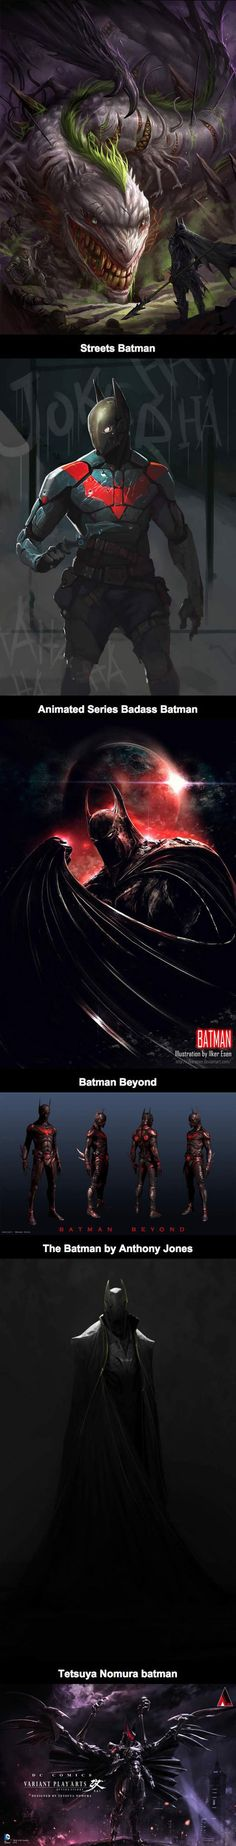 The Dark Knight Rocks